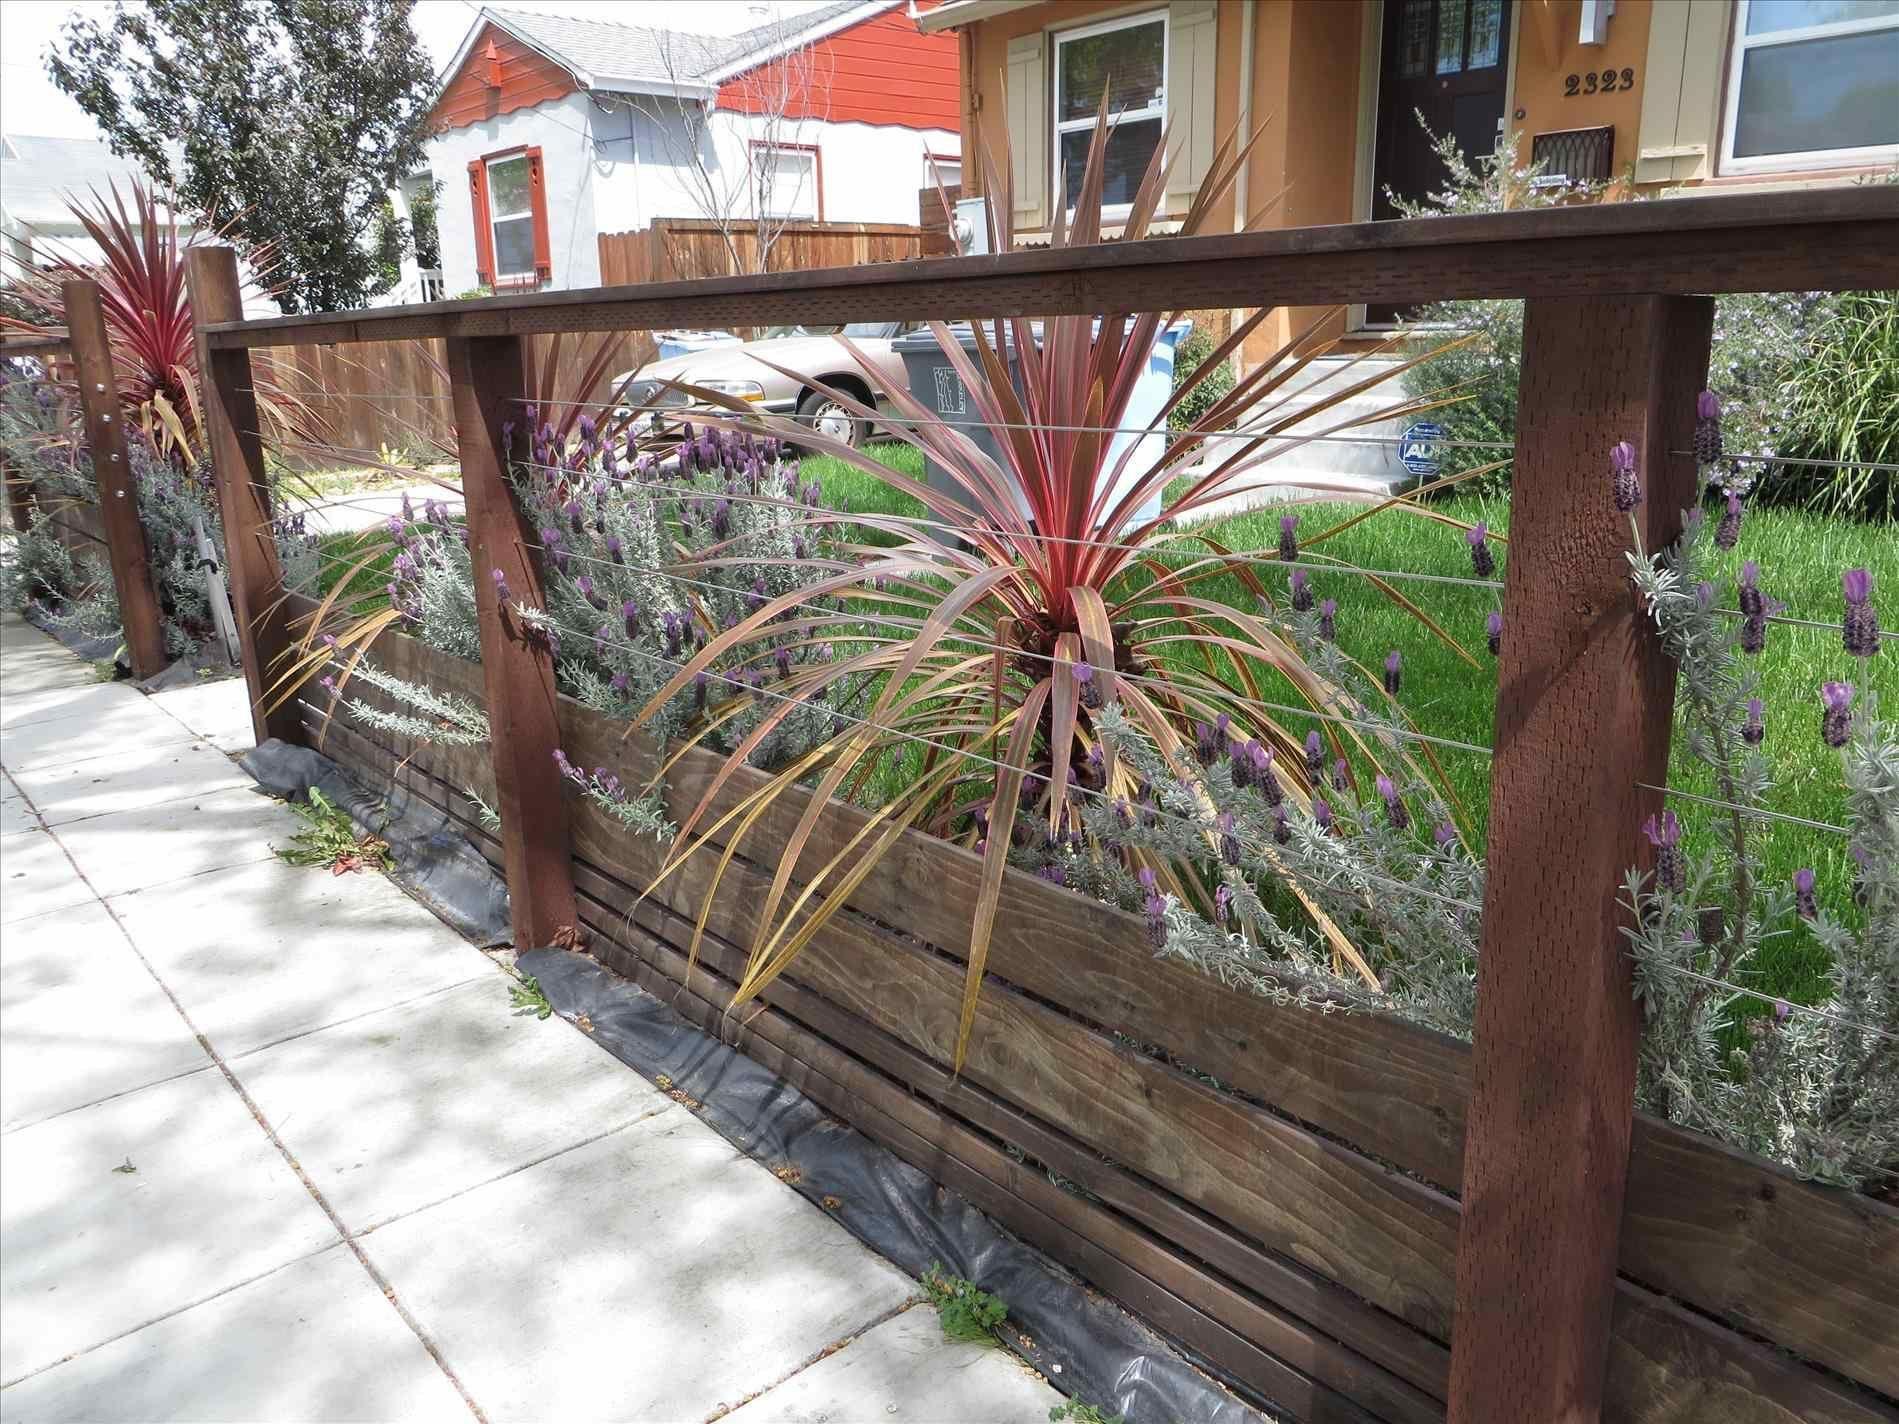 Stone And Horizontal Wood Fence Privacy Fence Ideas Fences Gates Inside Measurements 1899 X 1424 Fence Design